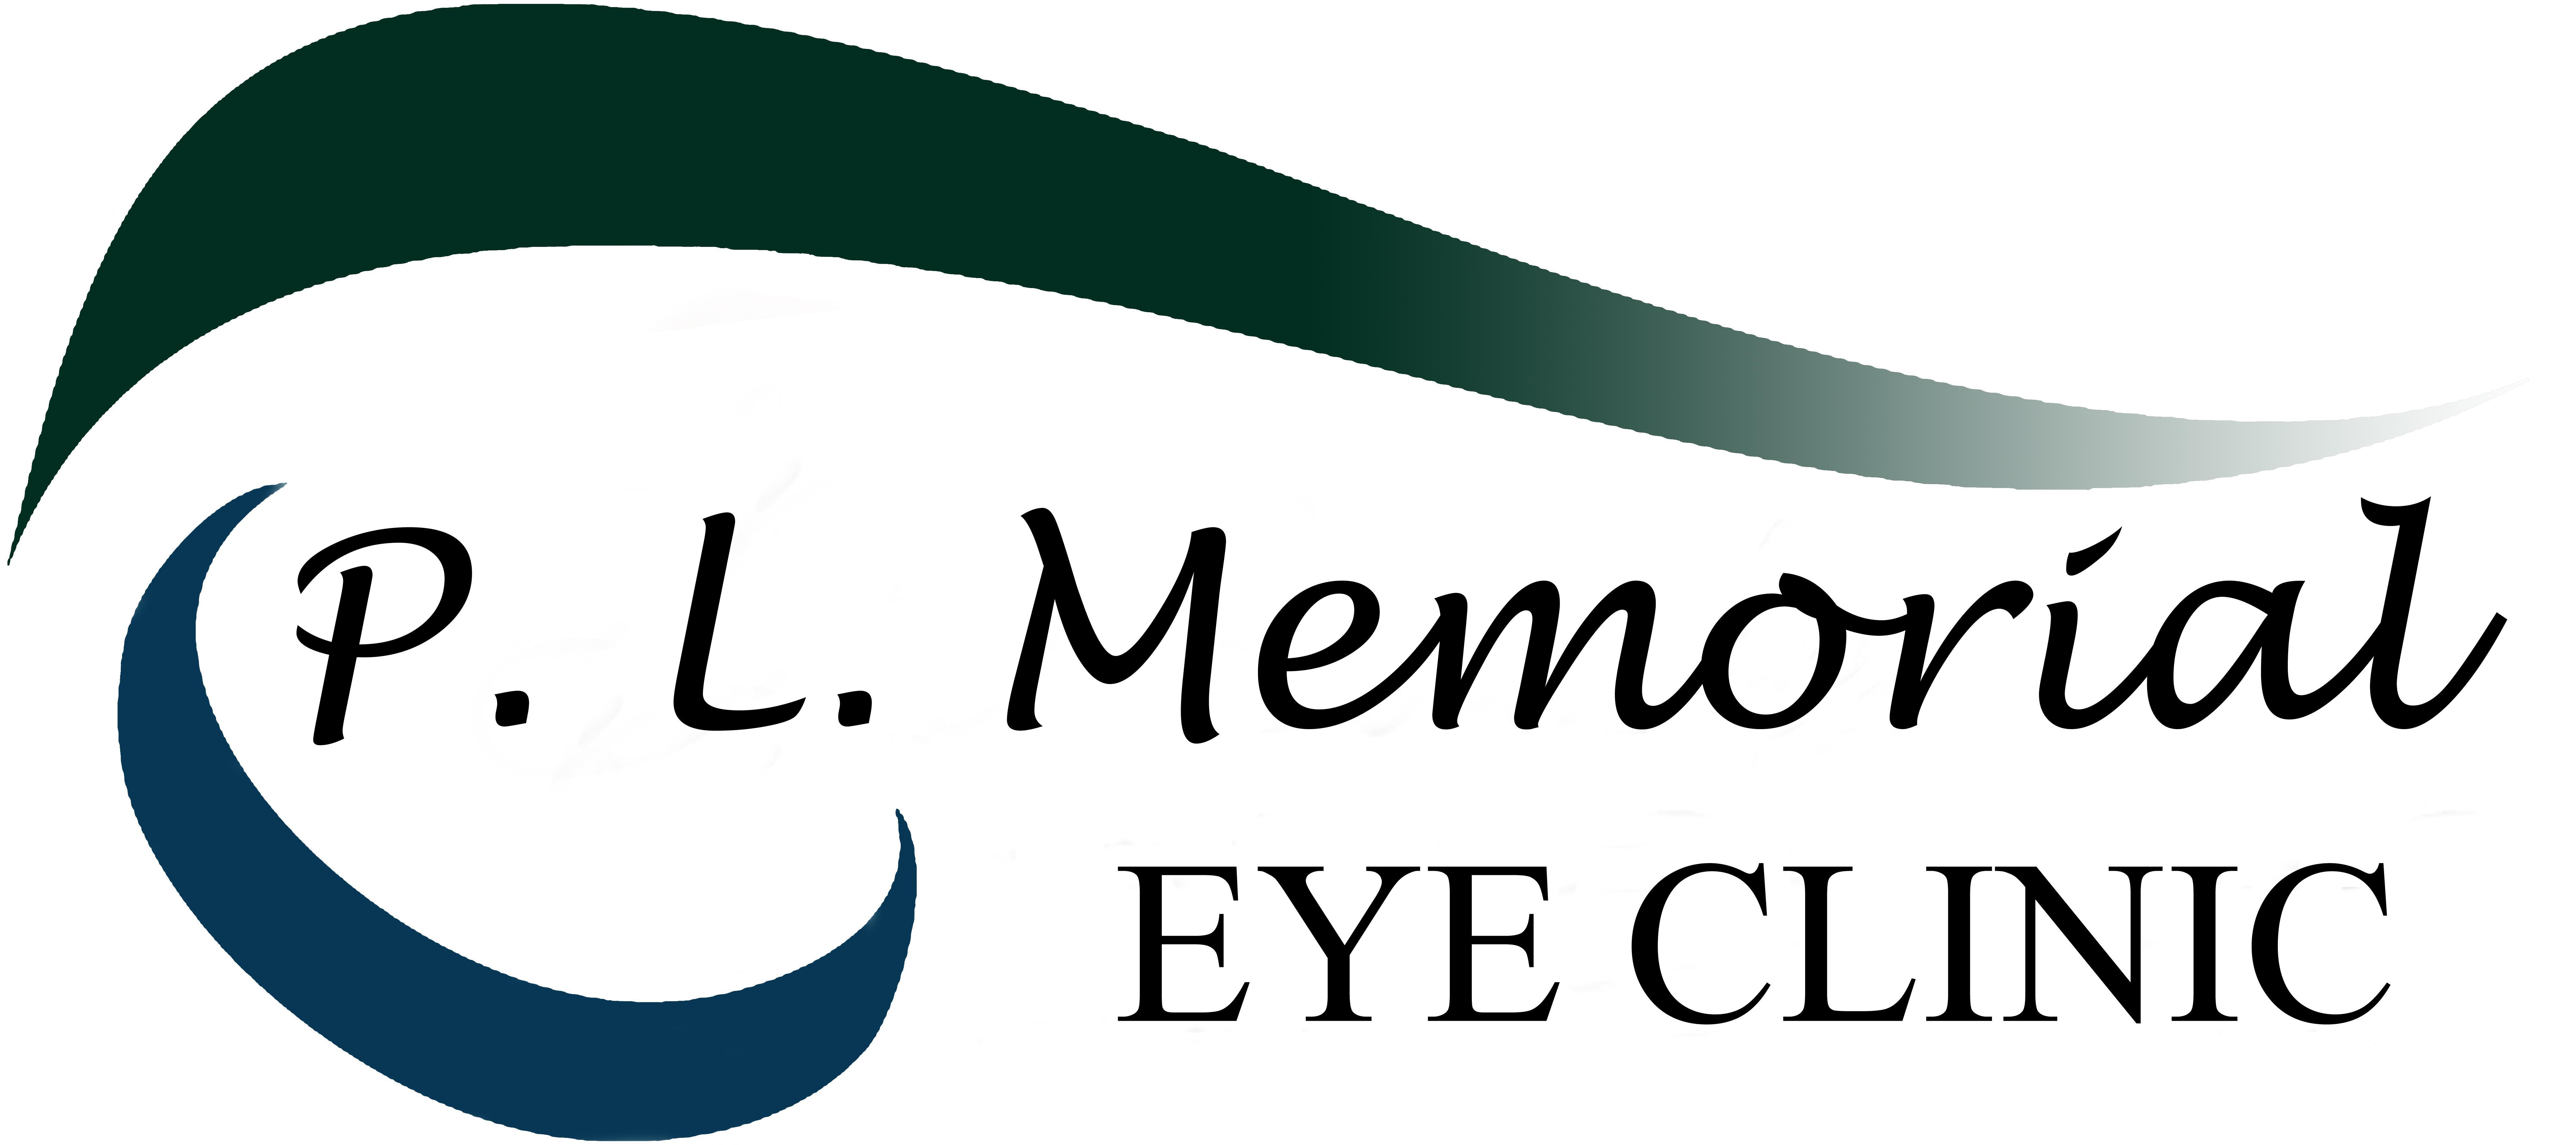 Pl Memorial Eye Clinic